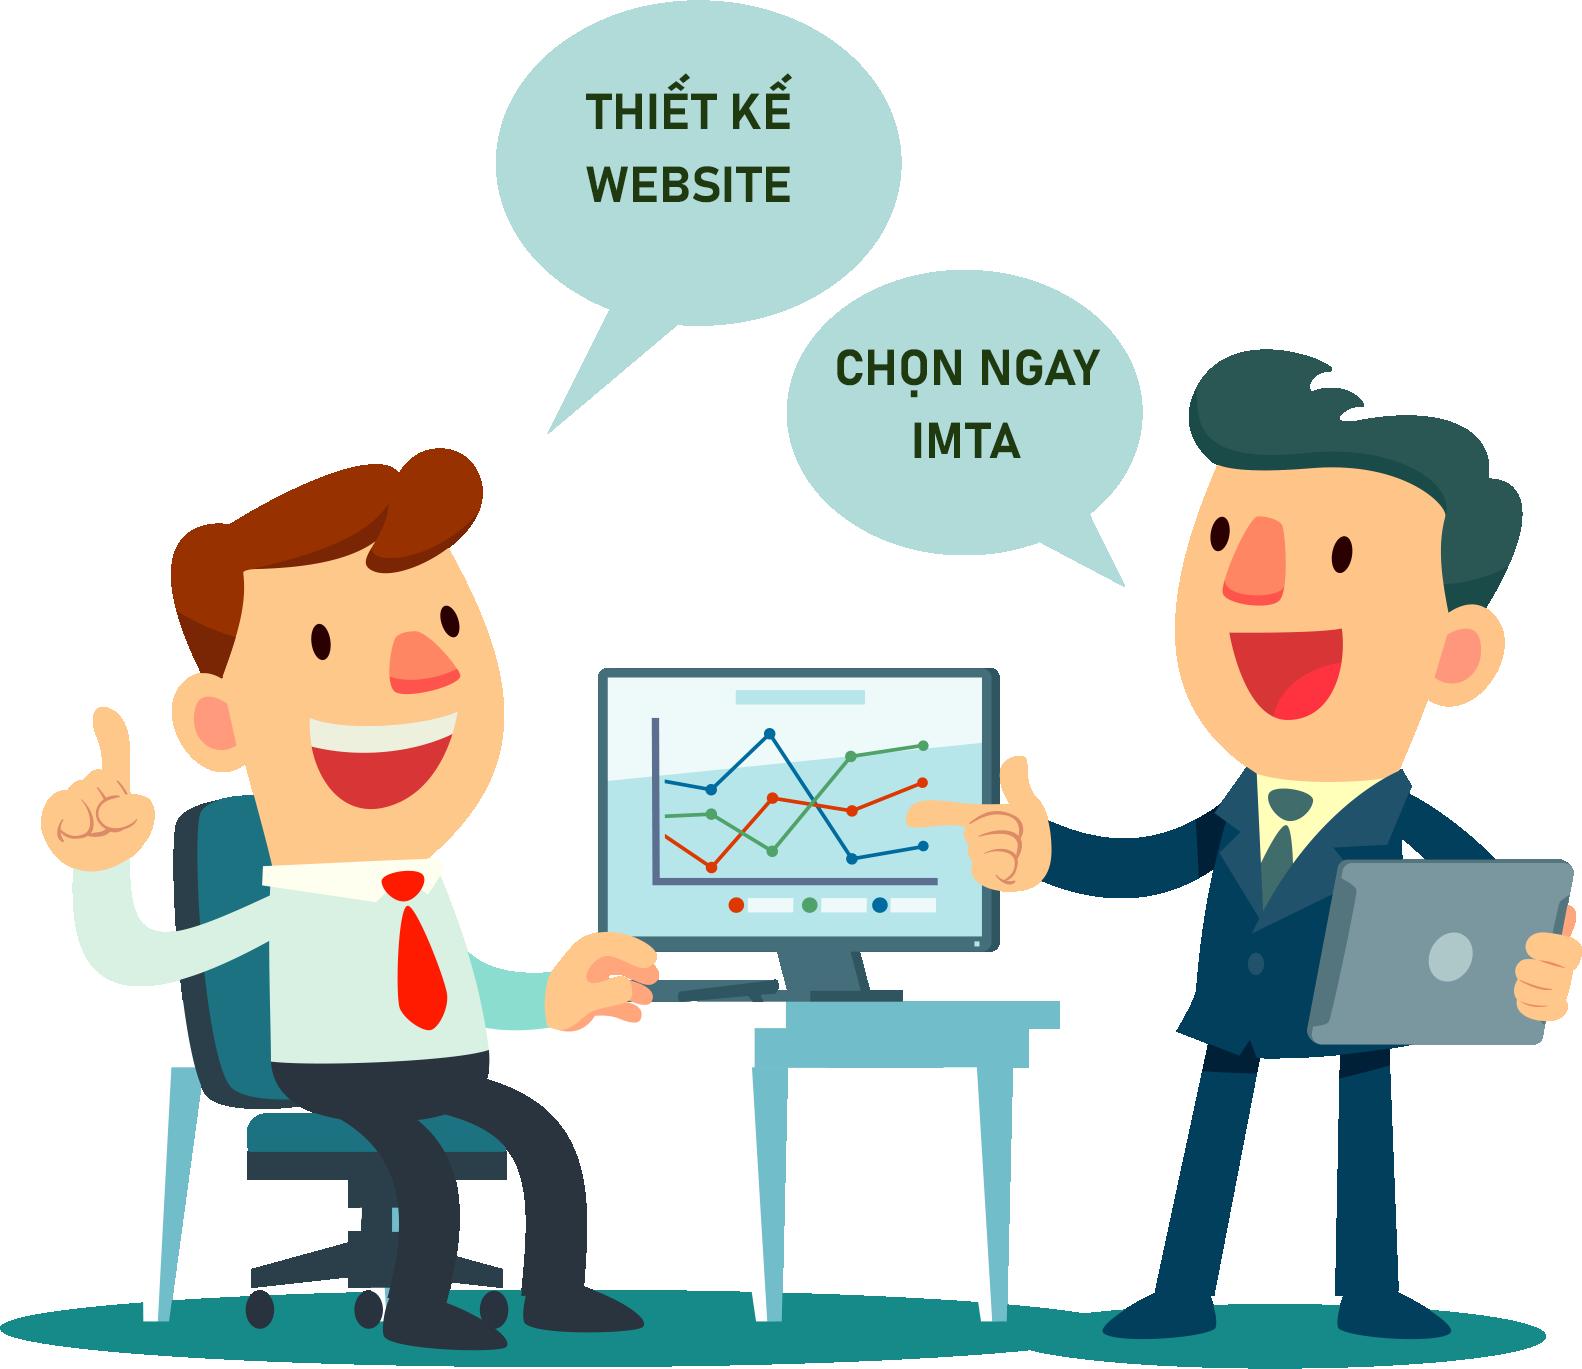 Thiết kế website chọn IMTA